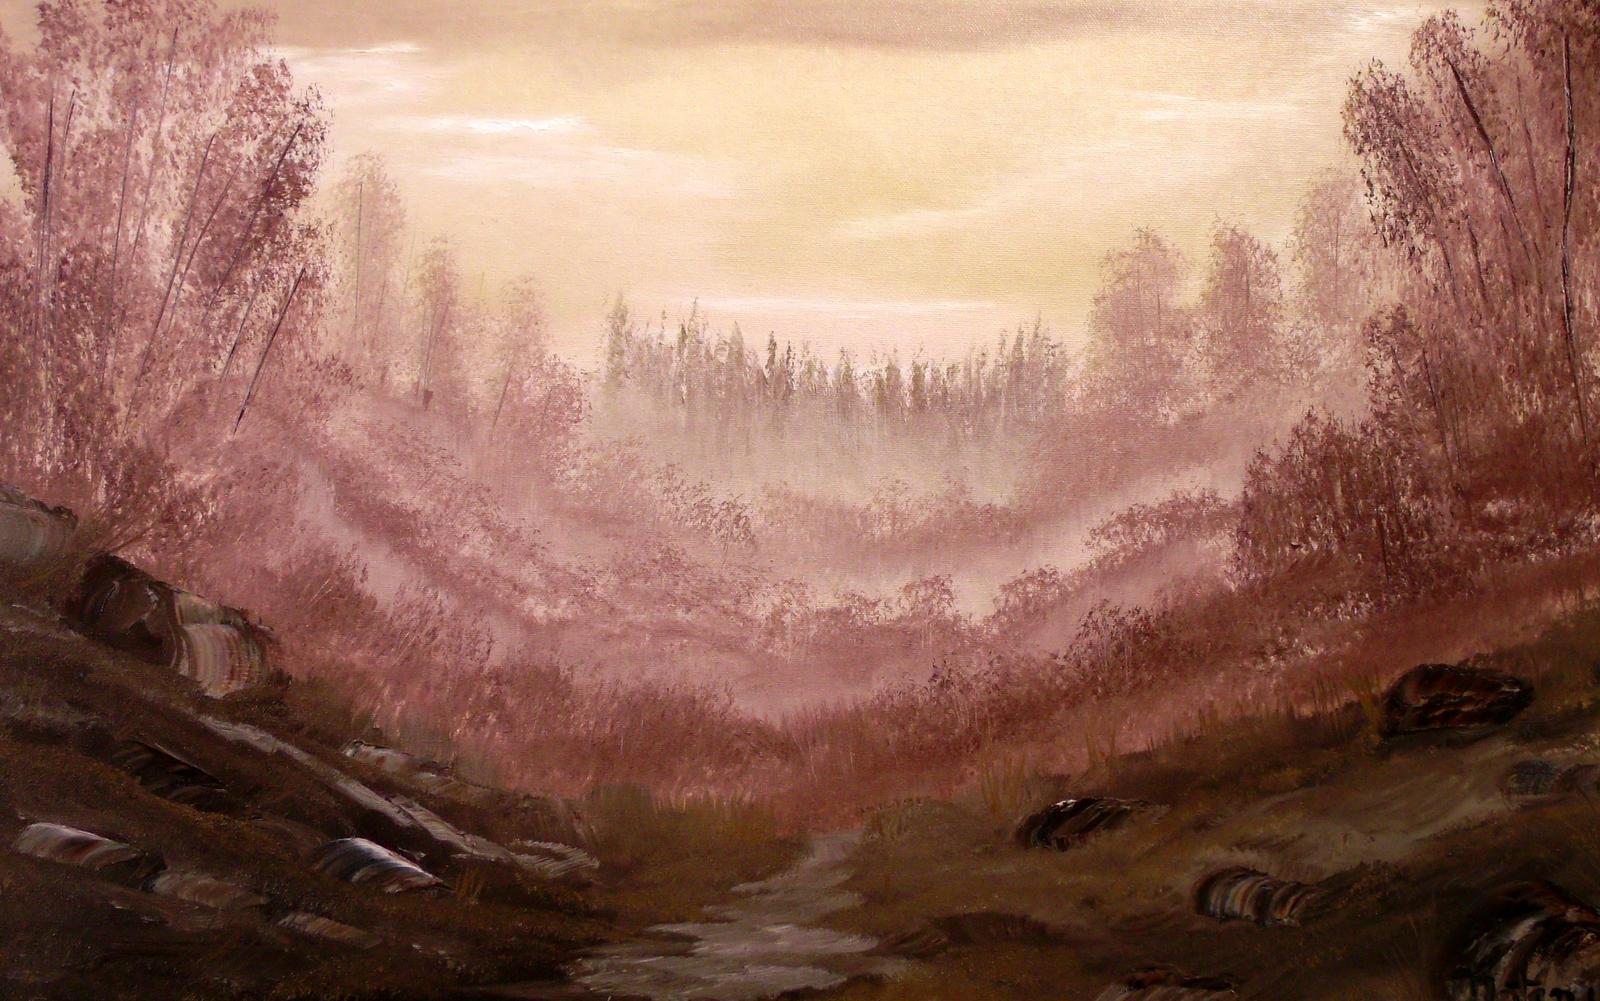 Autumn Motifs by Natan-Estivallet